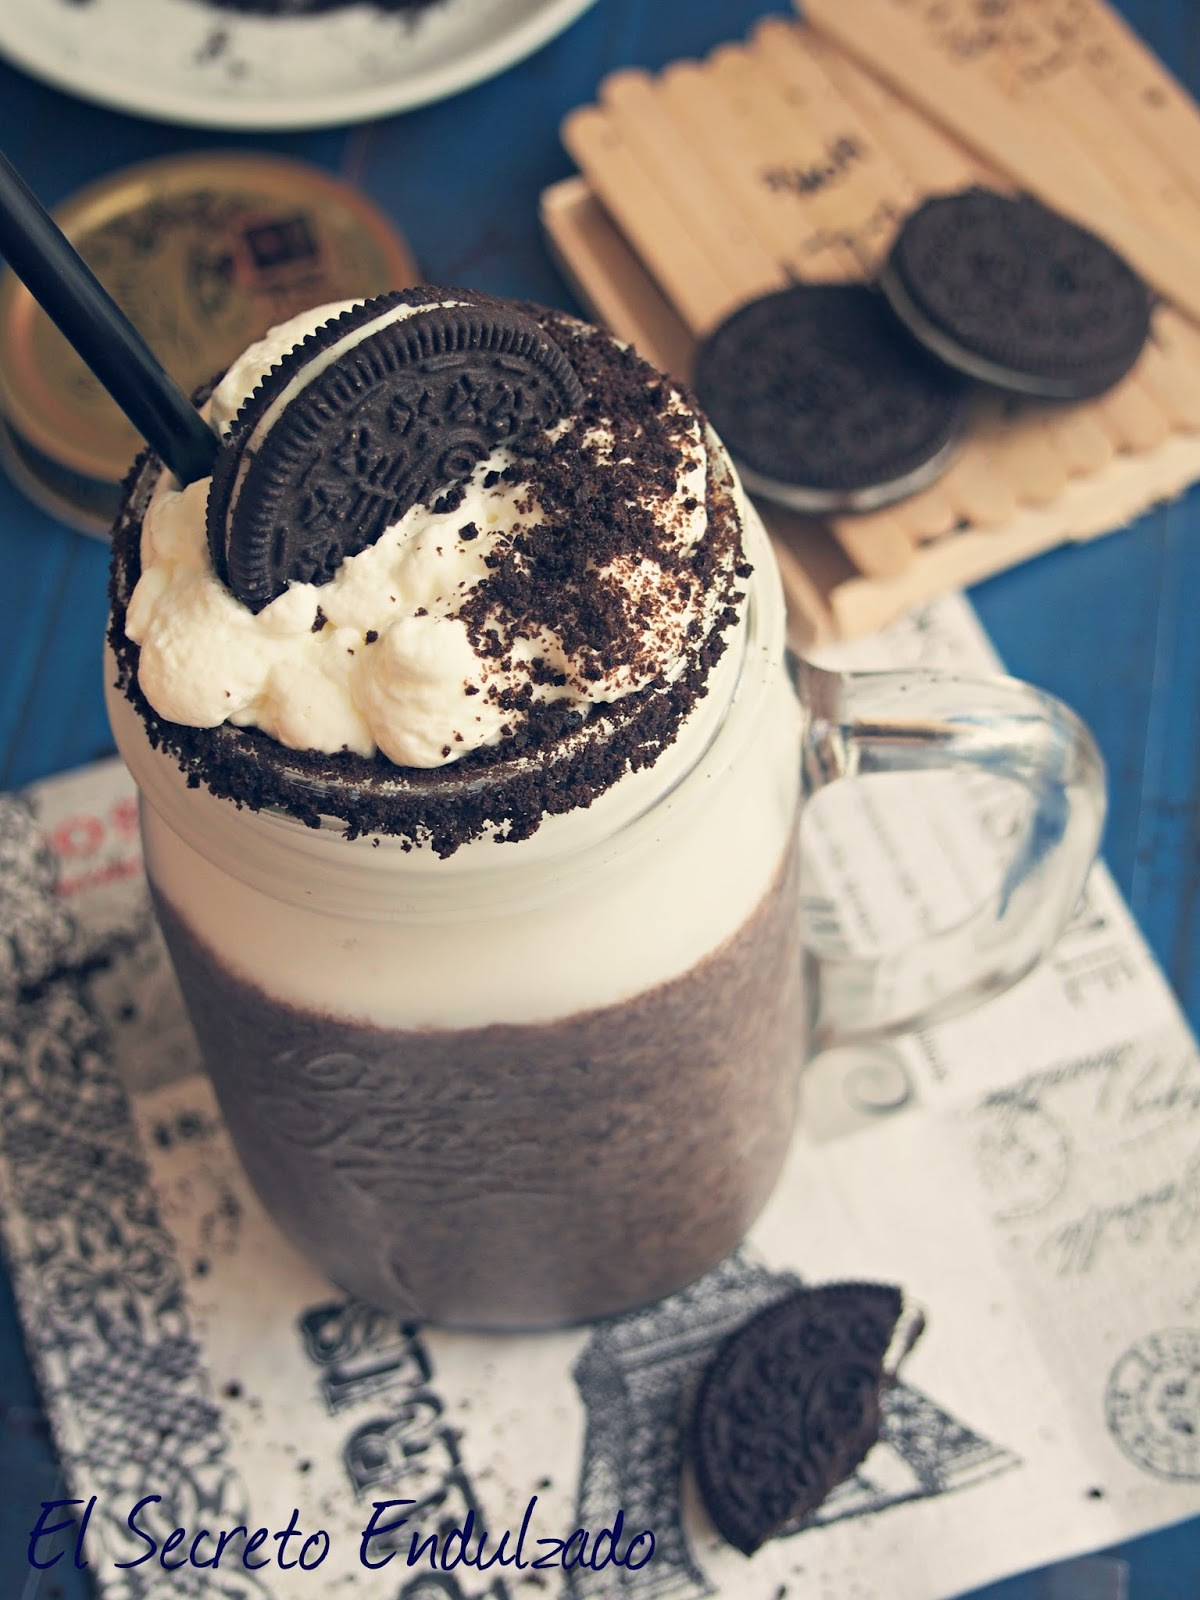 Al rico chocolate - 5 7